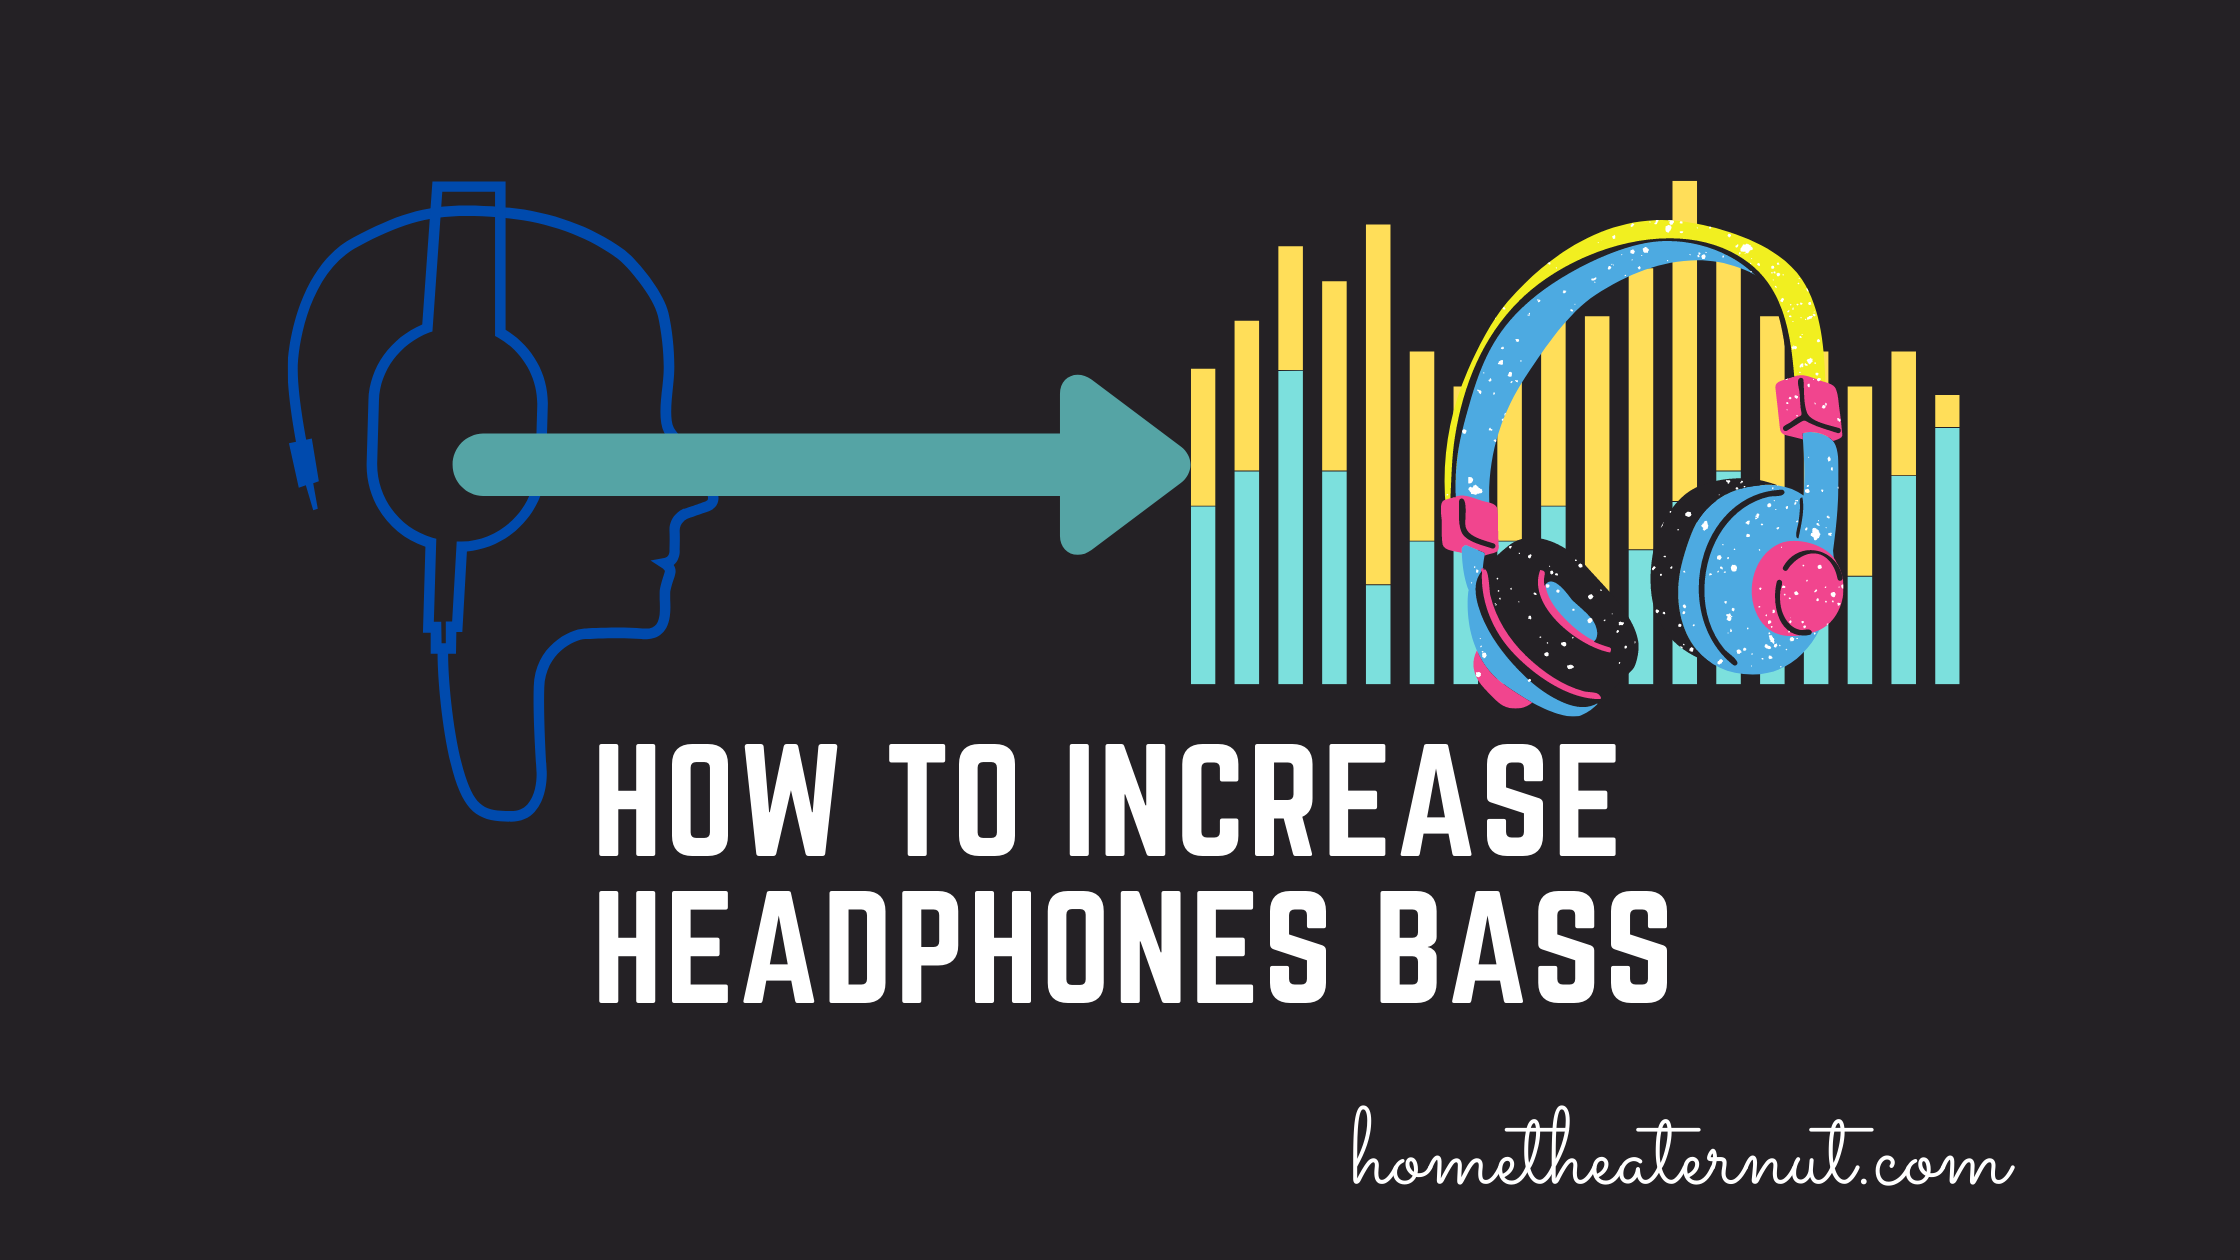 How to Increase Headphones Bass